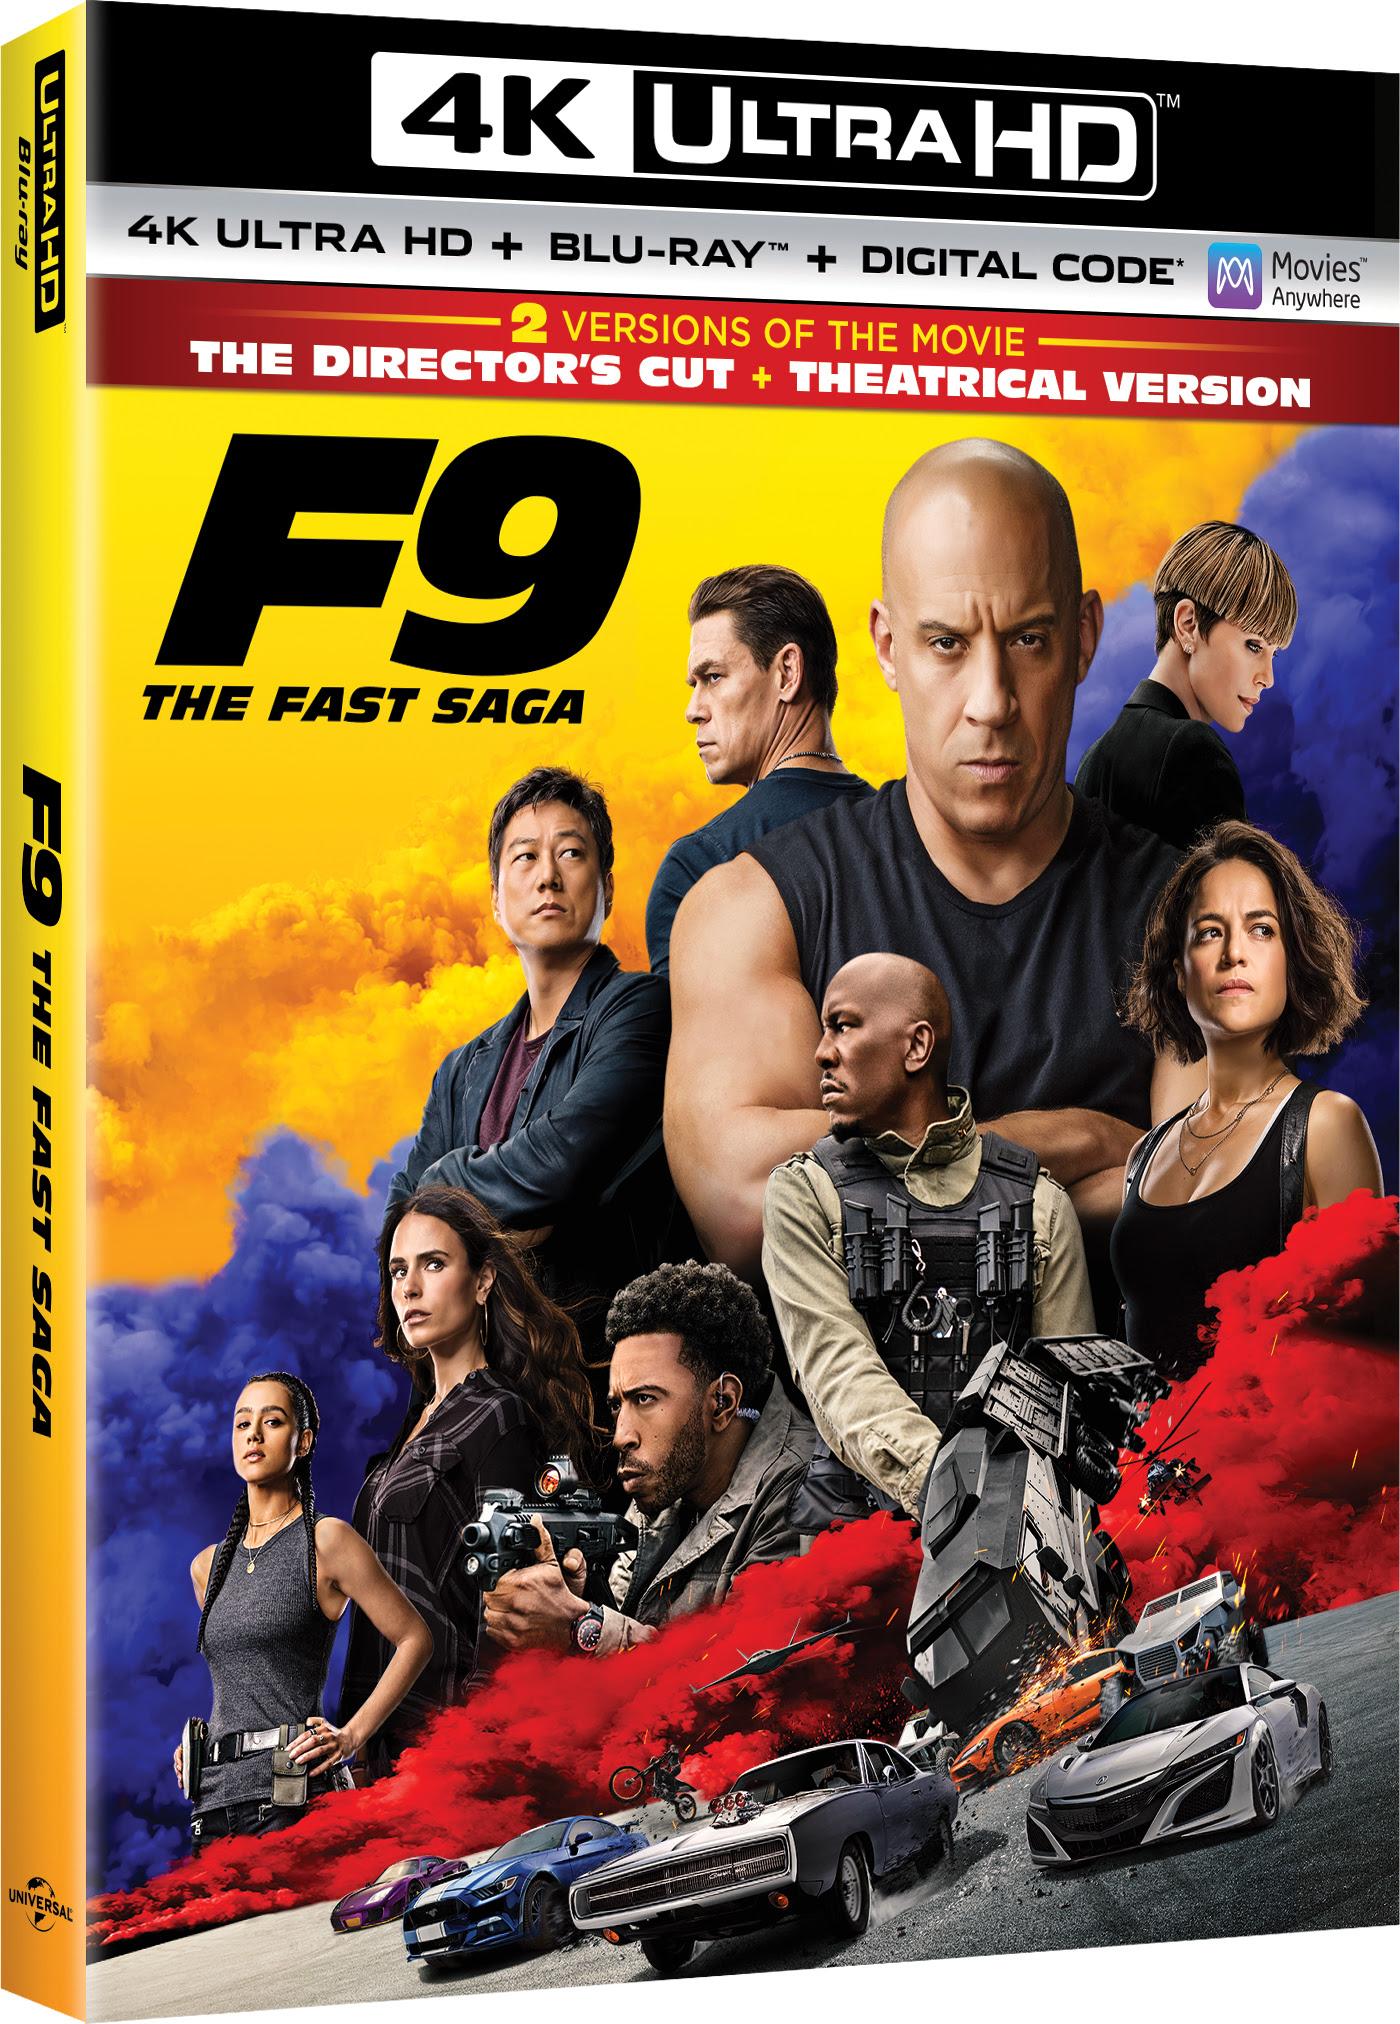 F9 Blu-ray release info